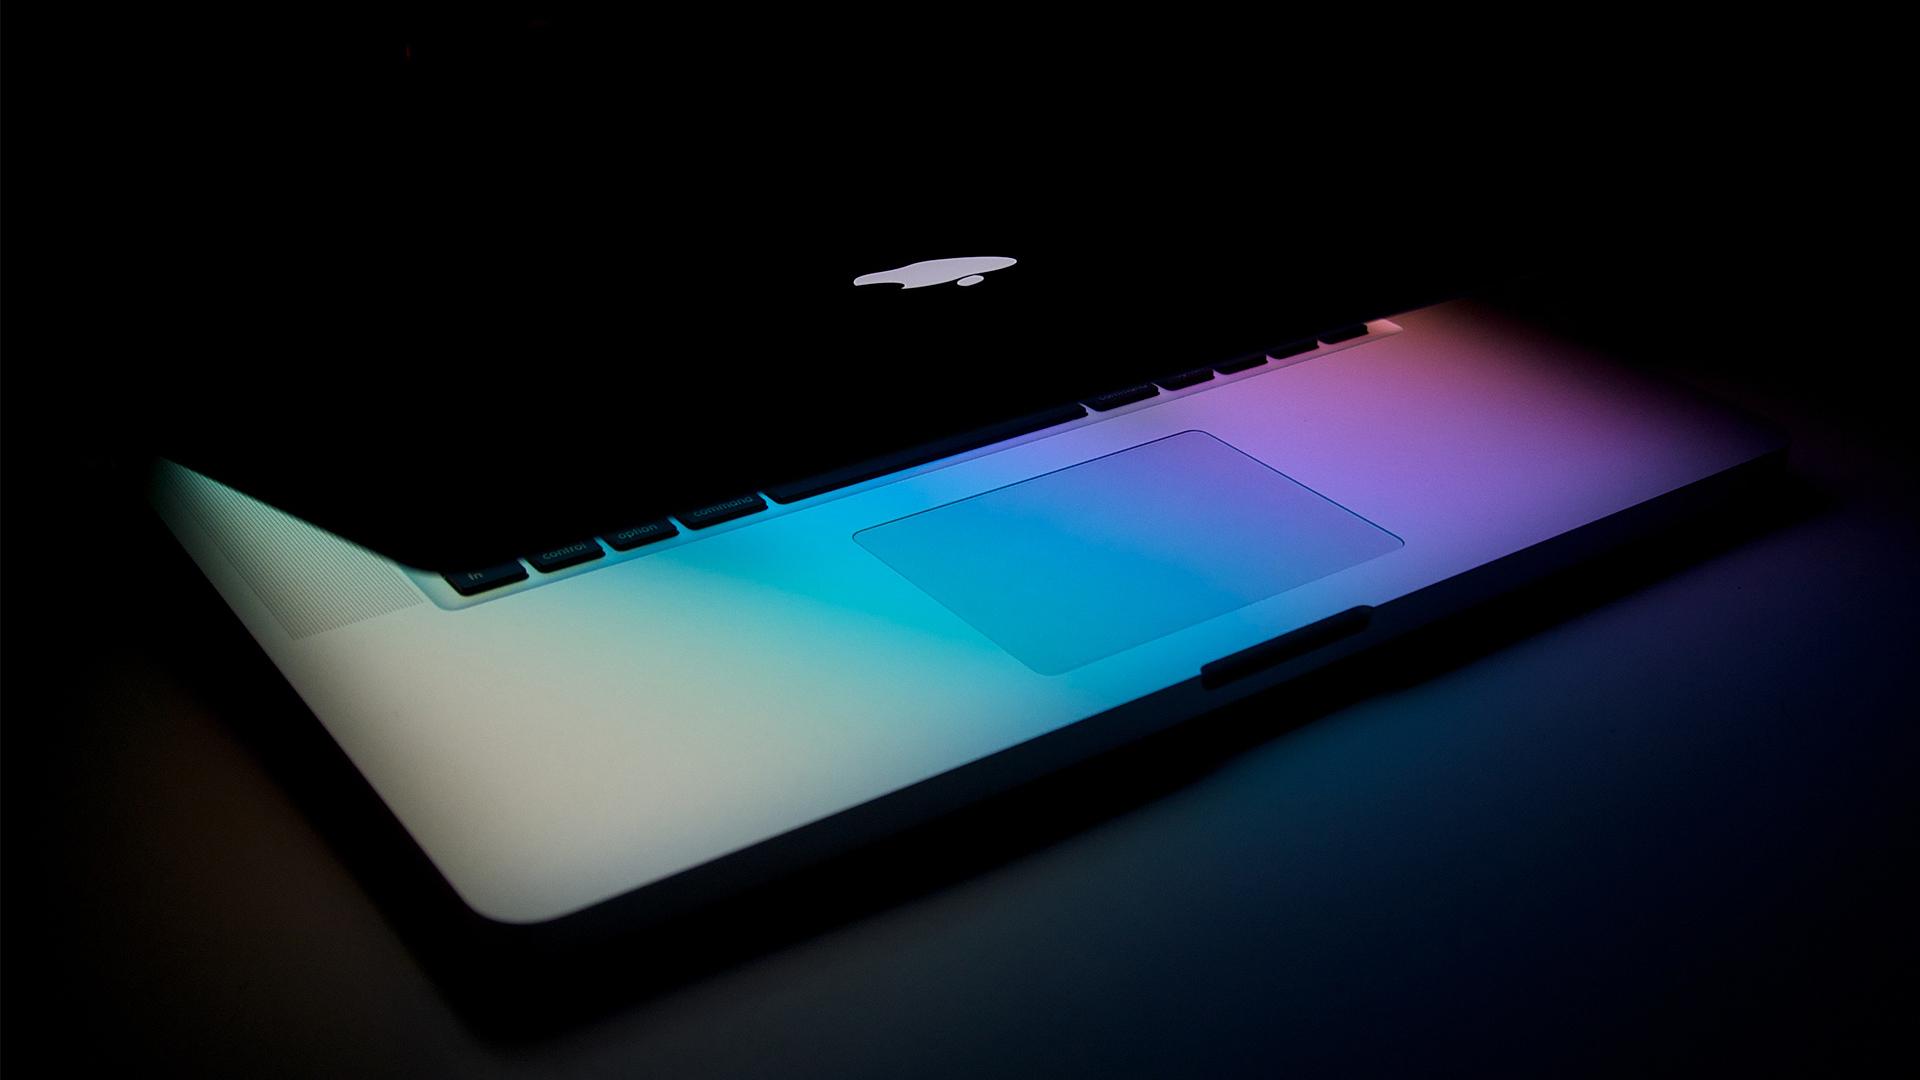 01840_macbookprojustawesome_1920x1080.jpg